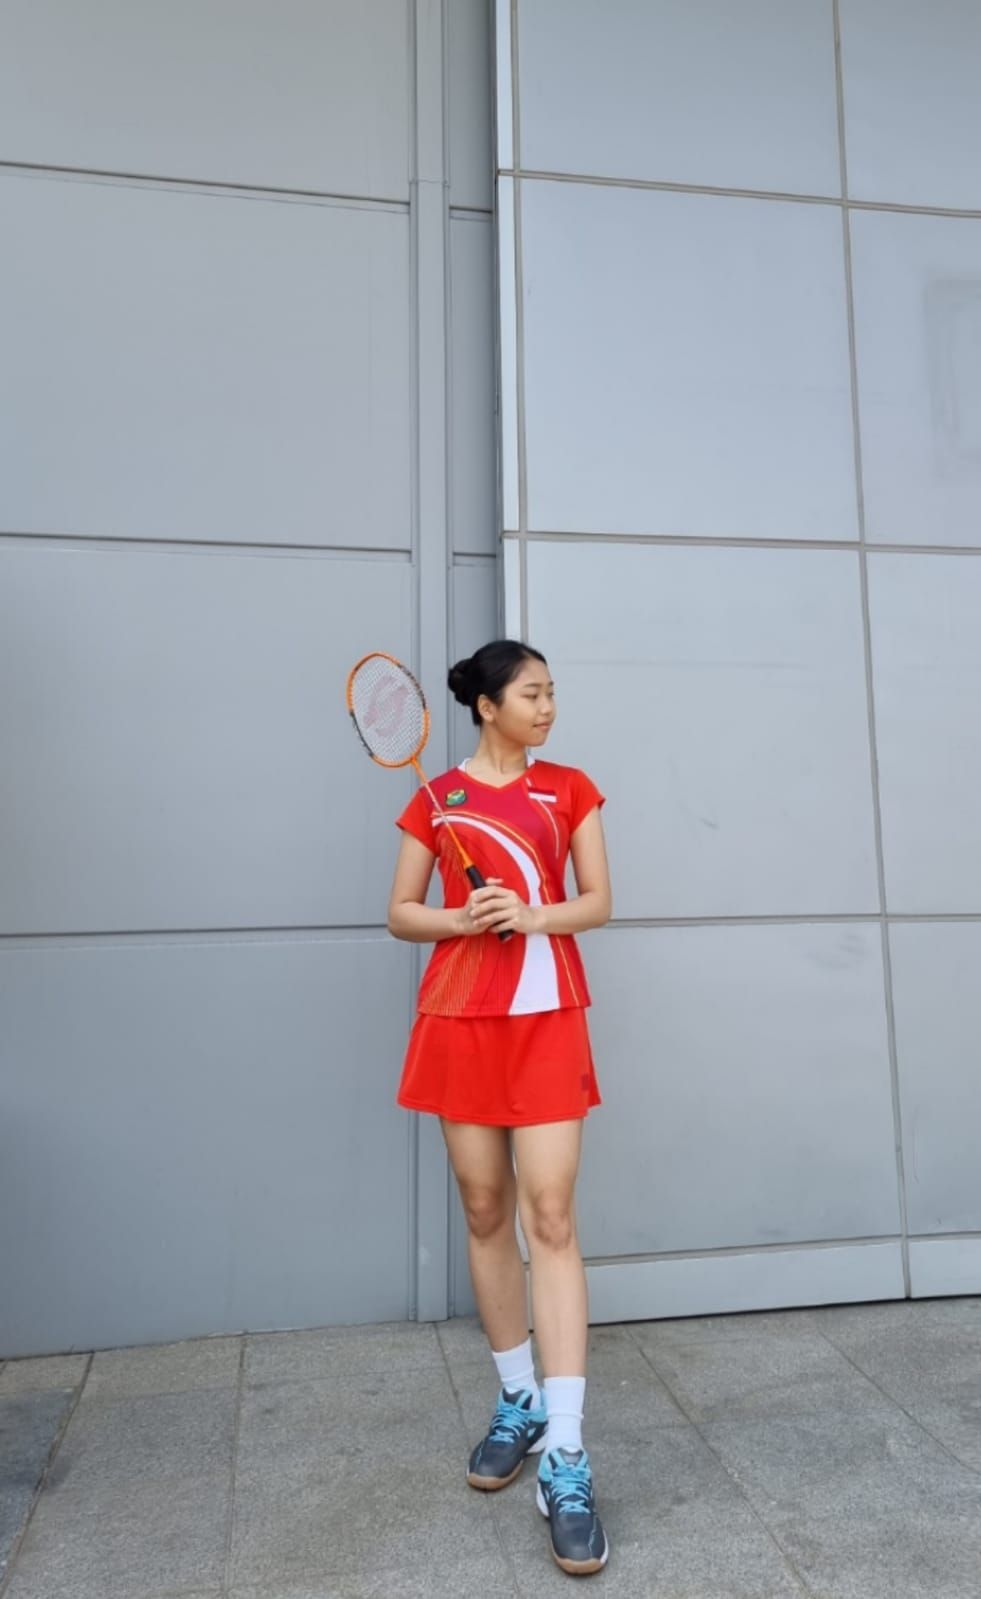 Ko Soobin, Putri Yannie Kim menjadi cameo Racket Boys